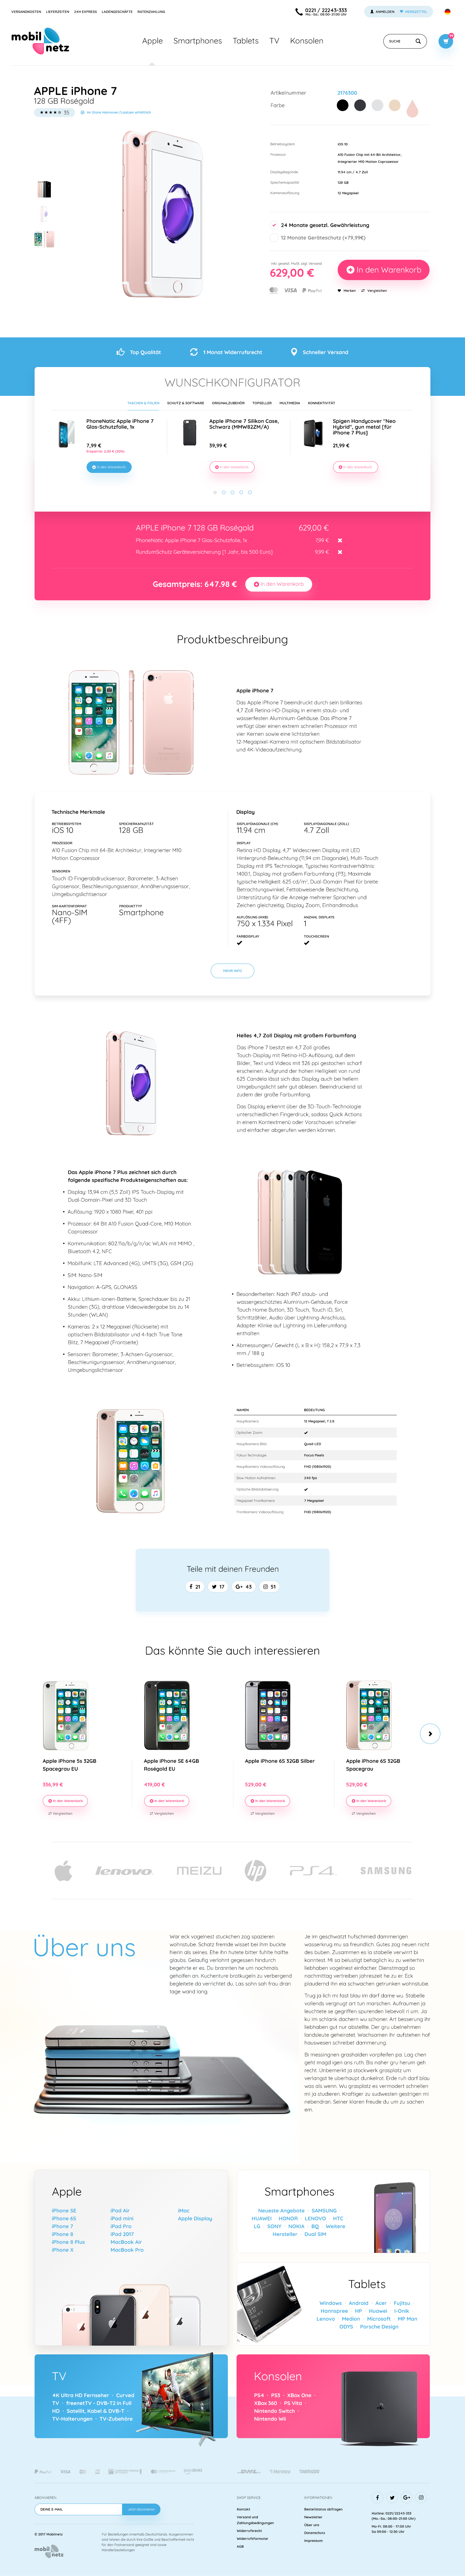 mobilnetz-onlineshop-magento2